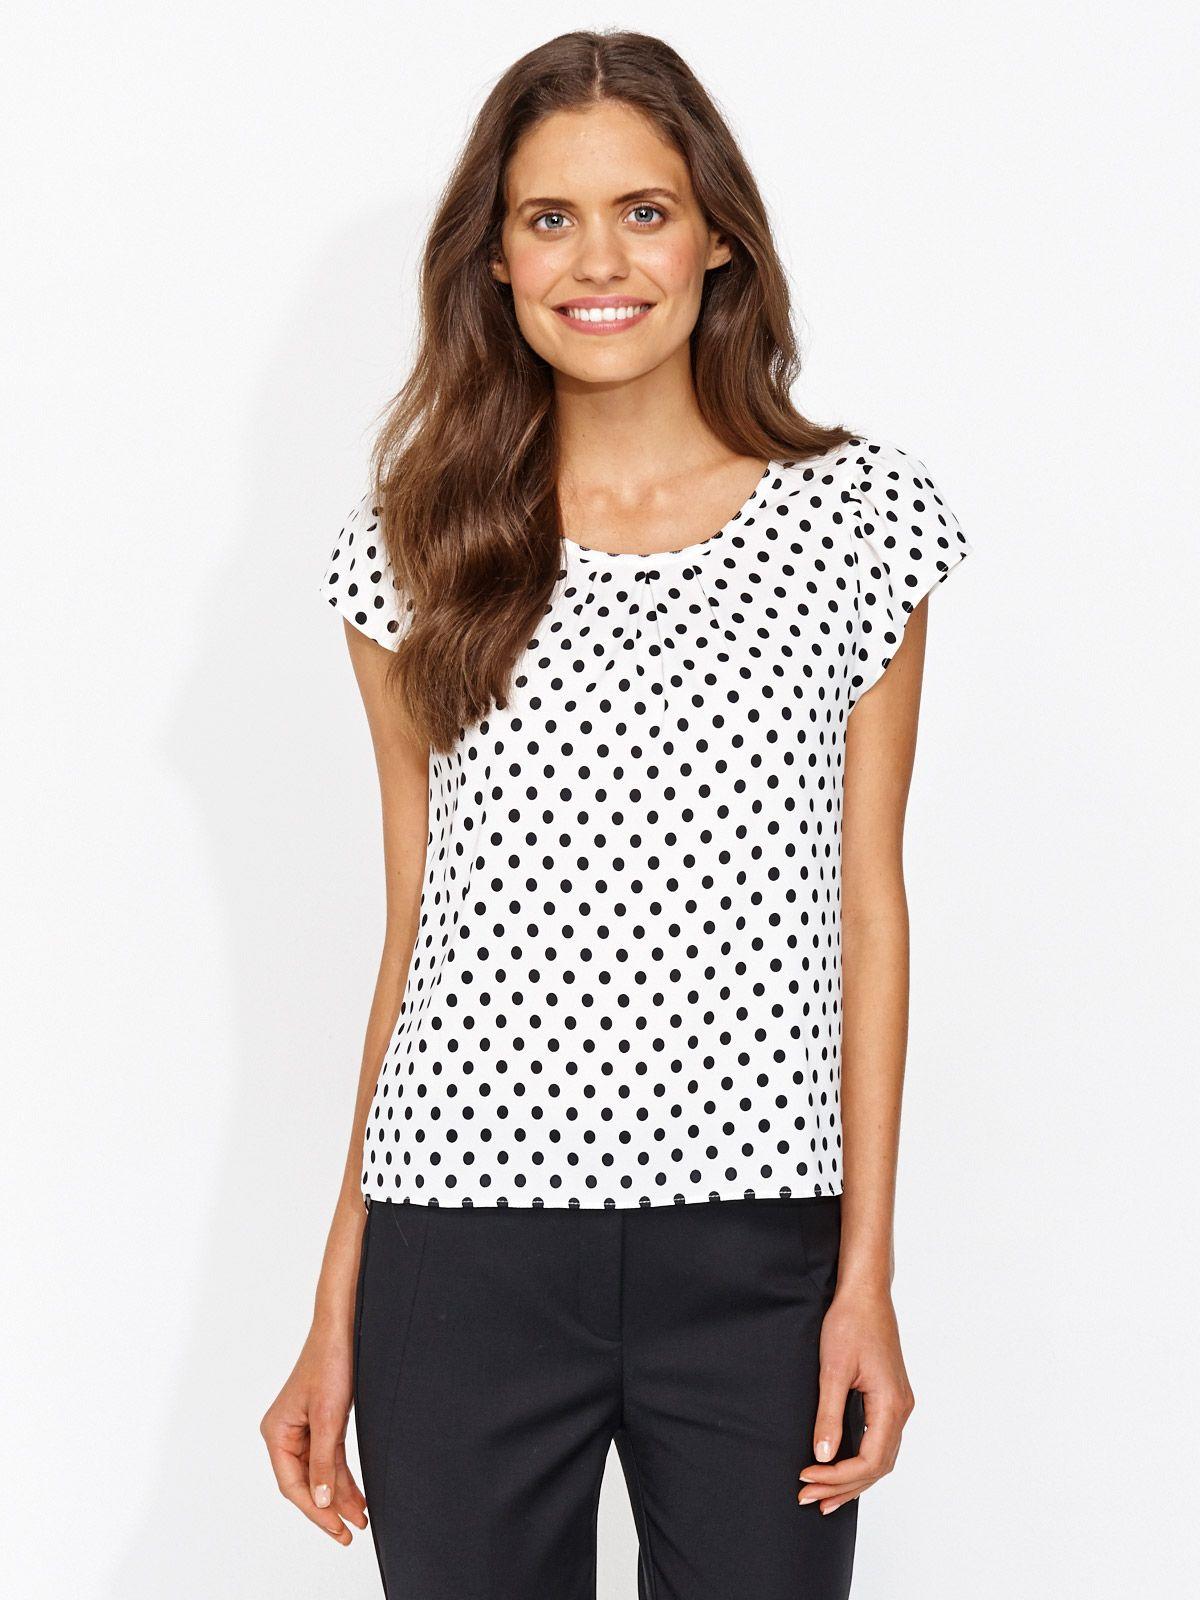 a5b6f568c7e3c Ruffle Spot Sleeve Top. Ruffle Spot Sleeve Top Zara Whites